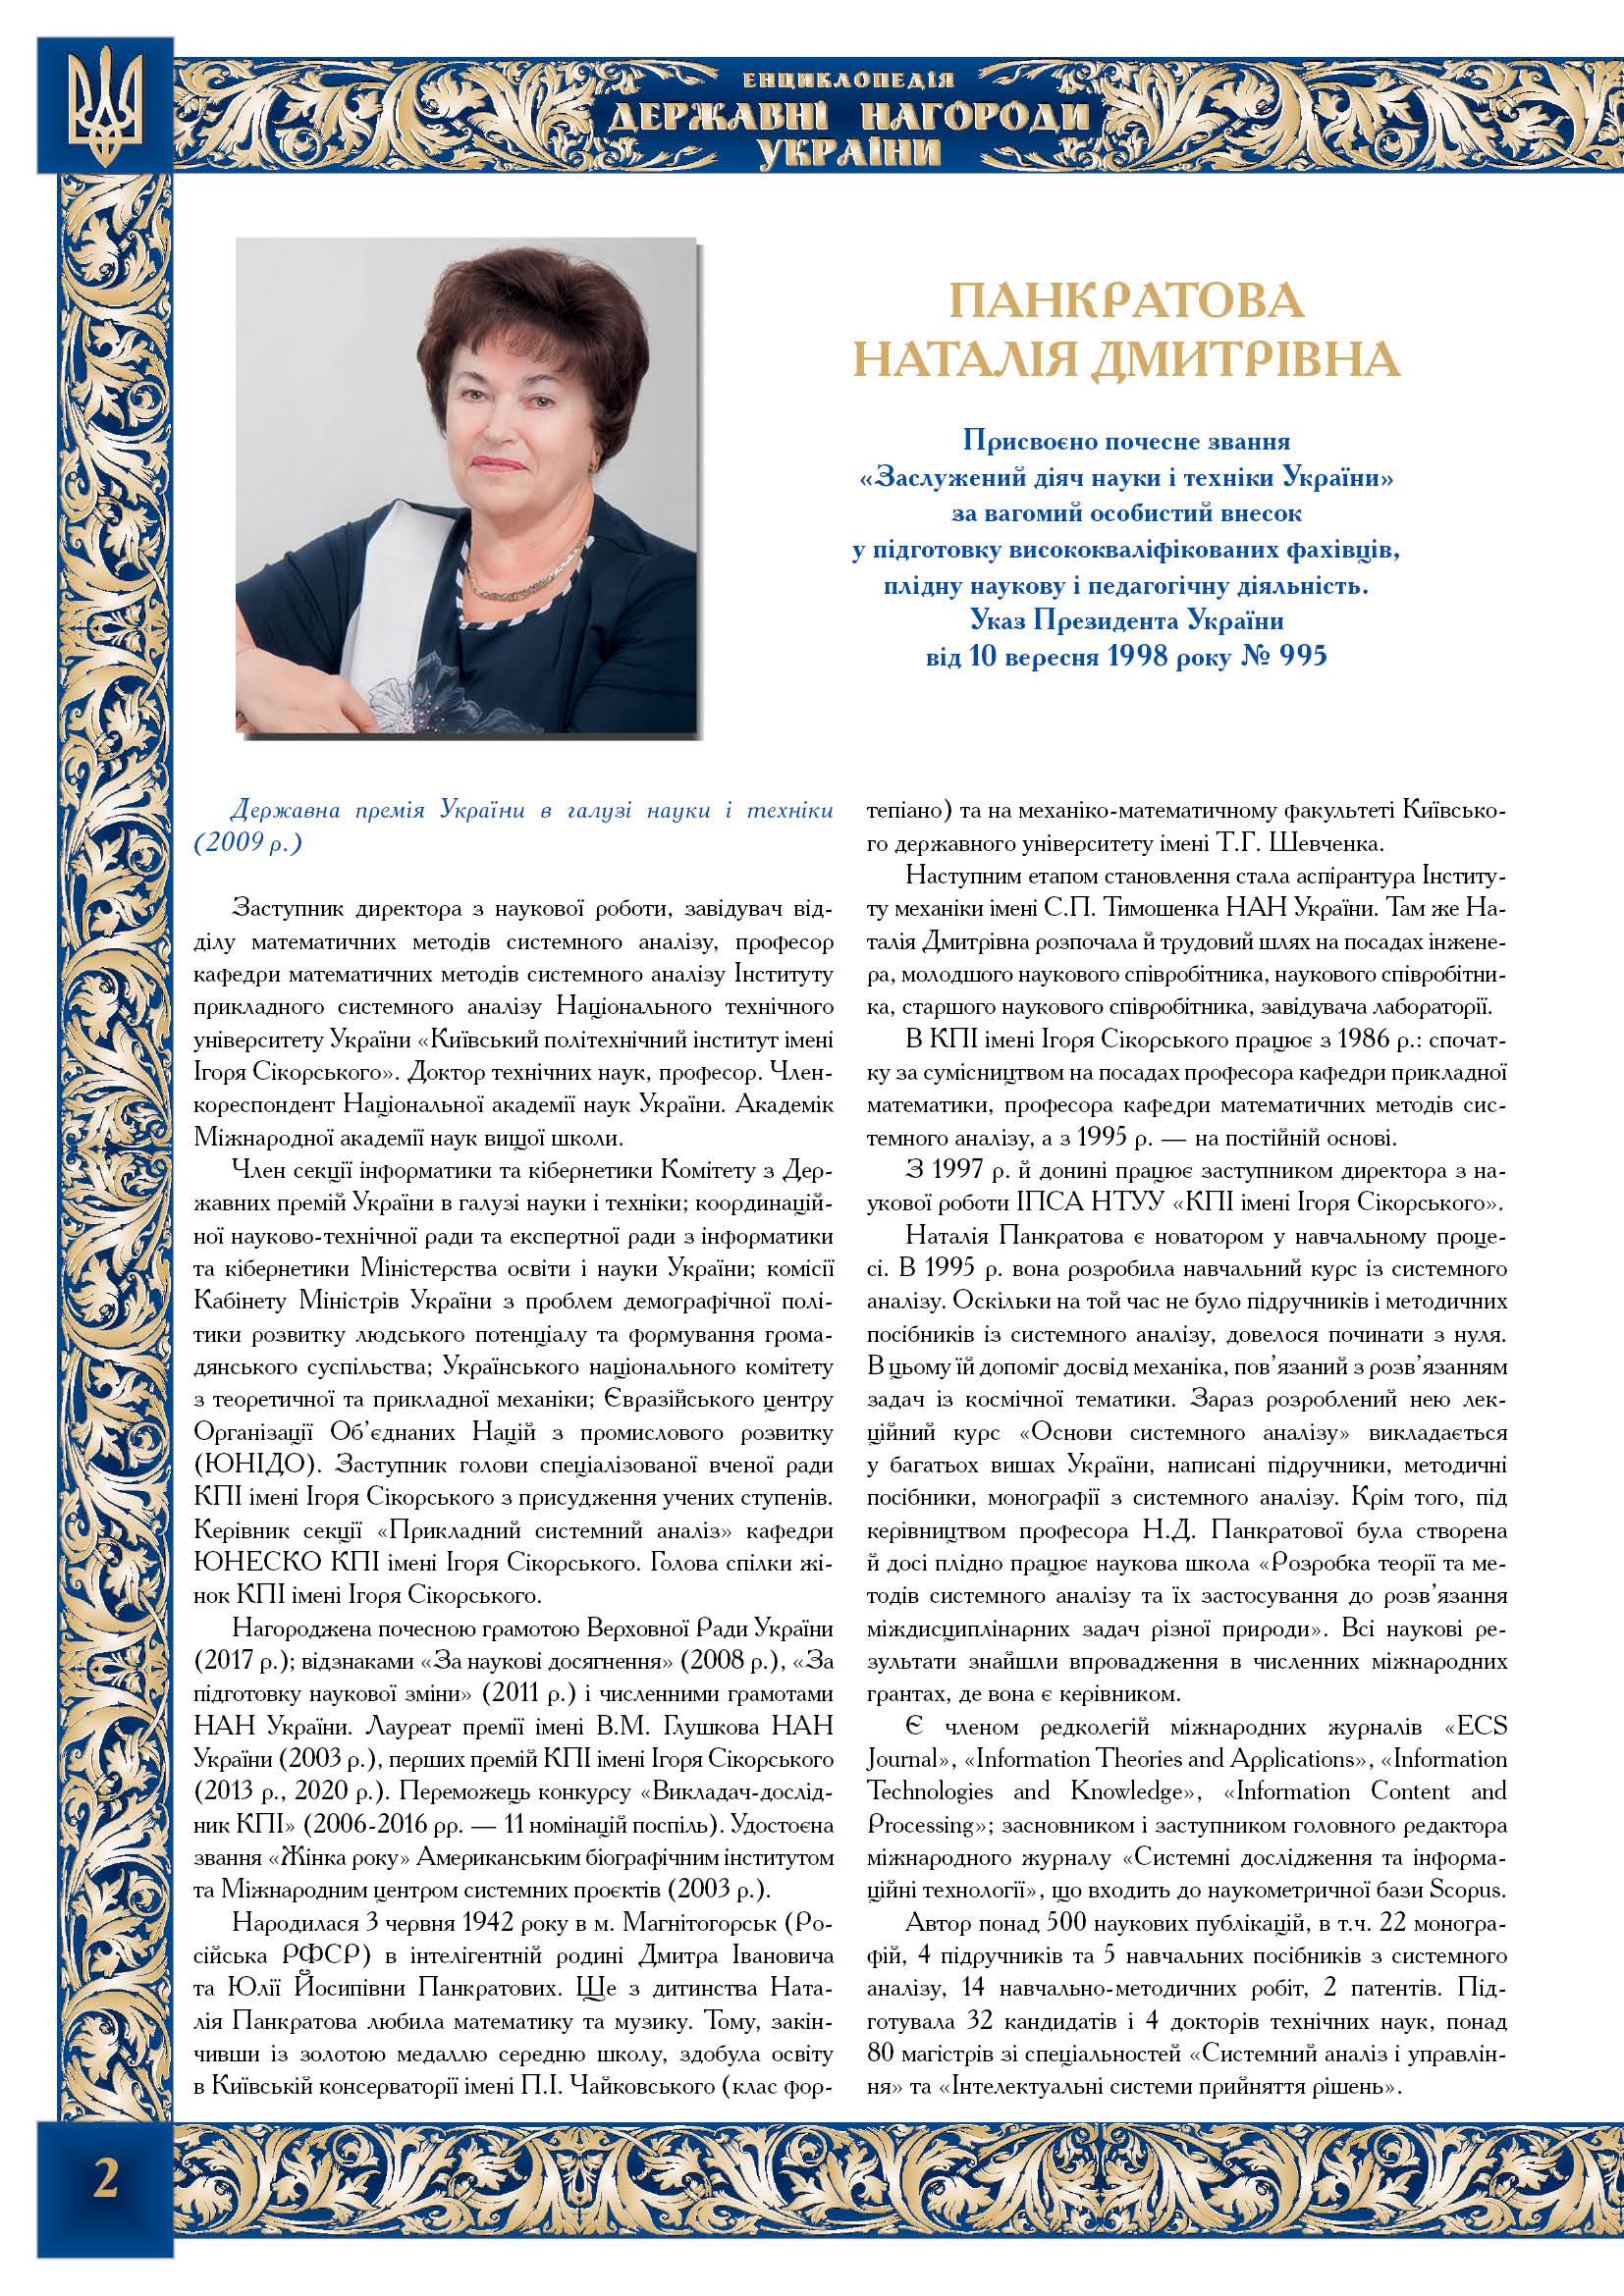 Панкратова Наталія Дмитрівна